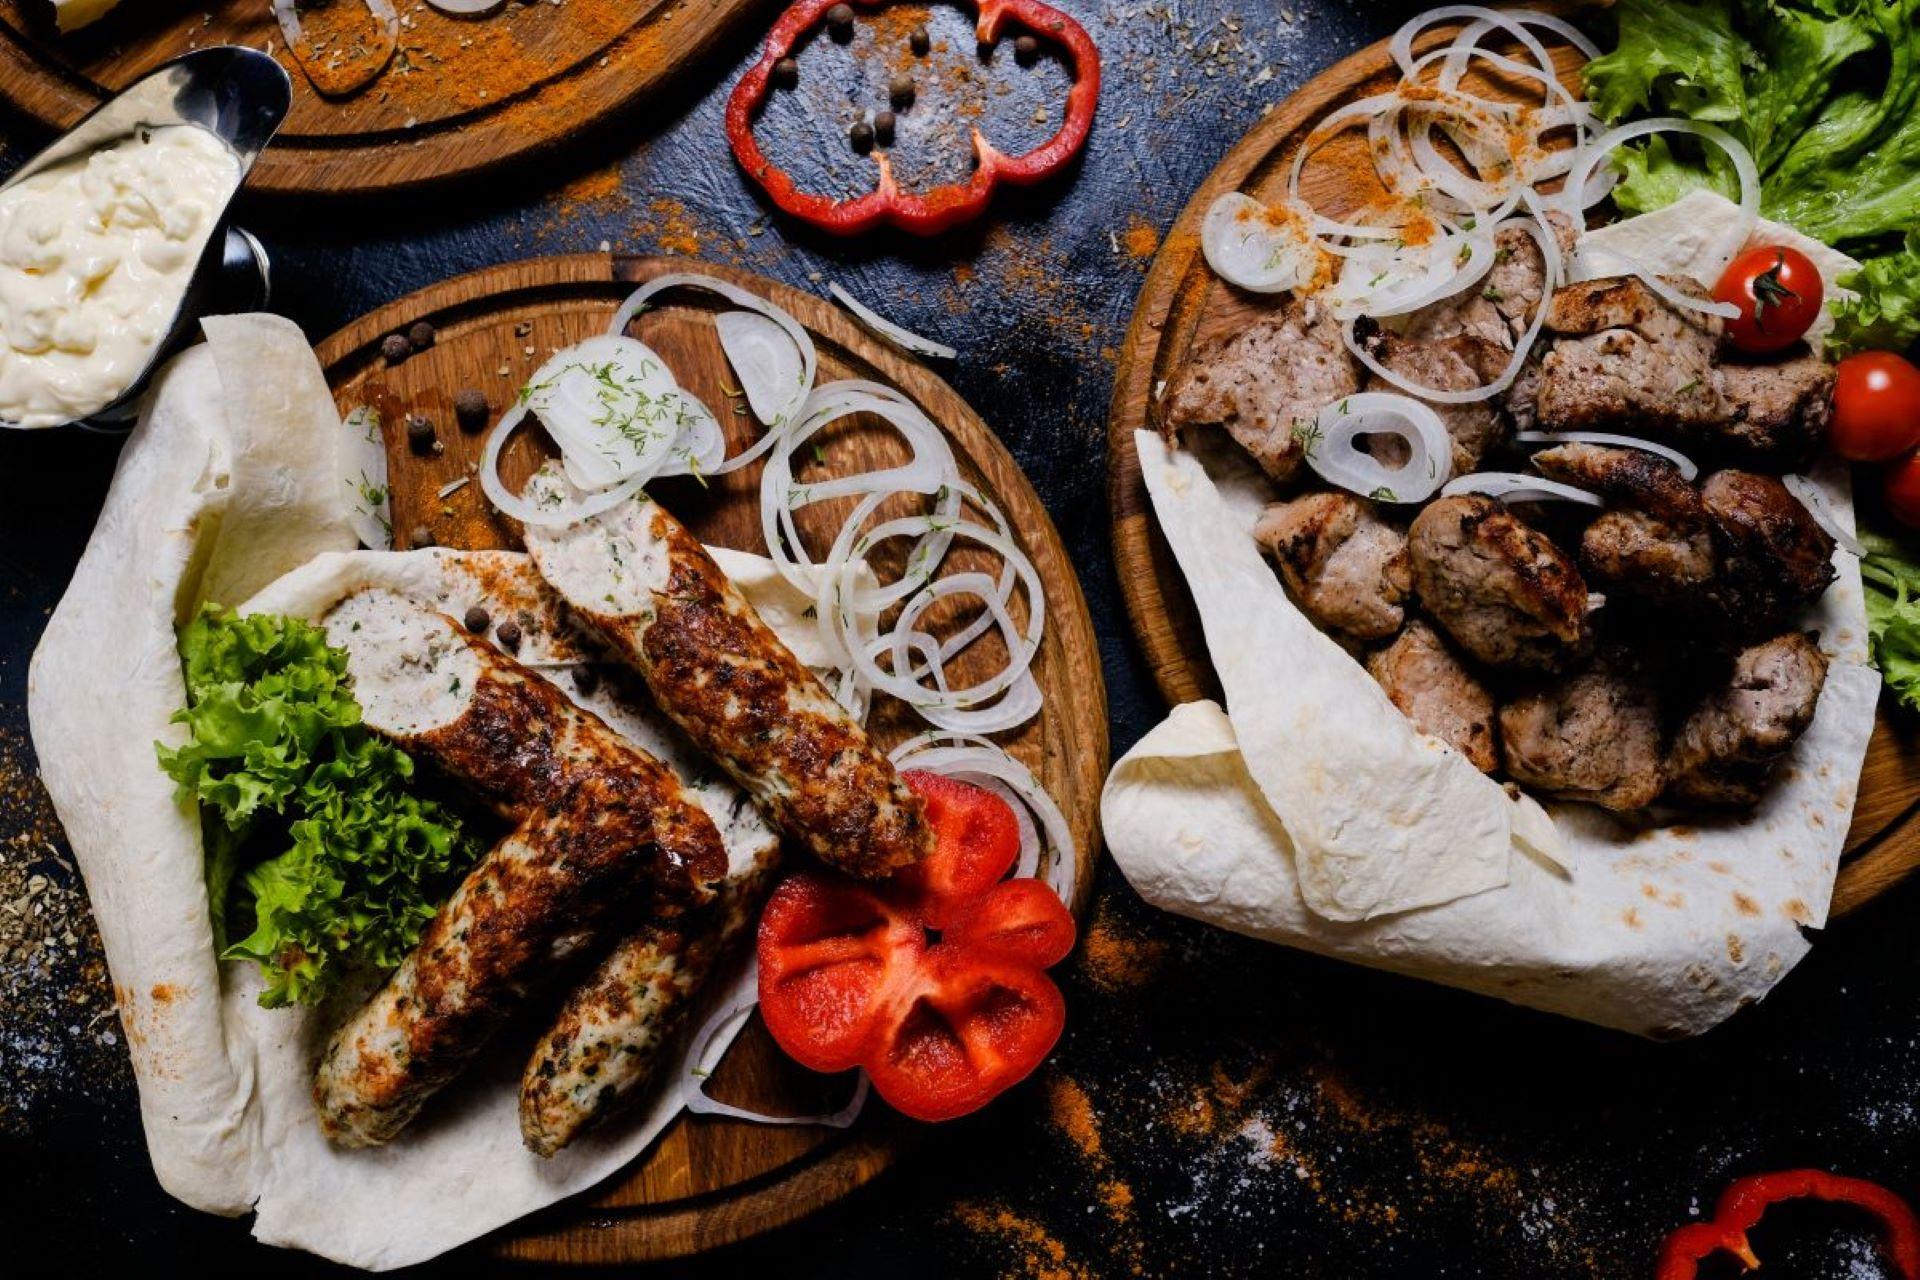 Арменска кухня Тур Пловдив по арменски Slowtours.bg